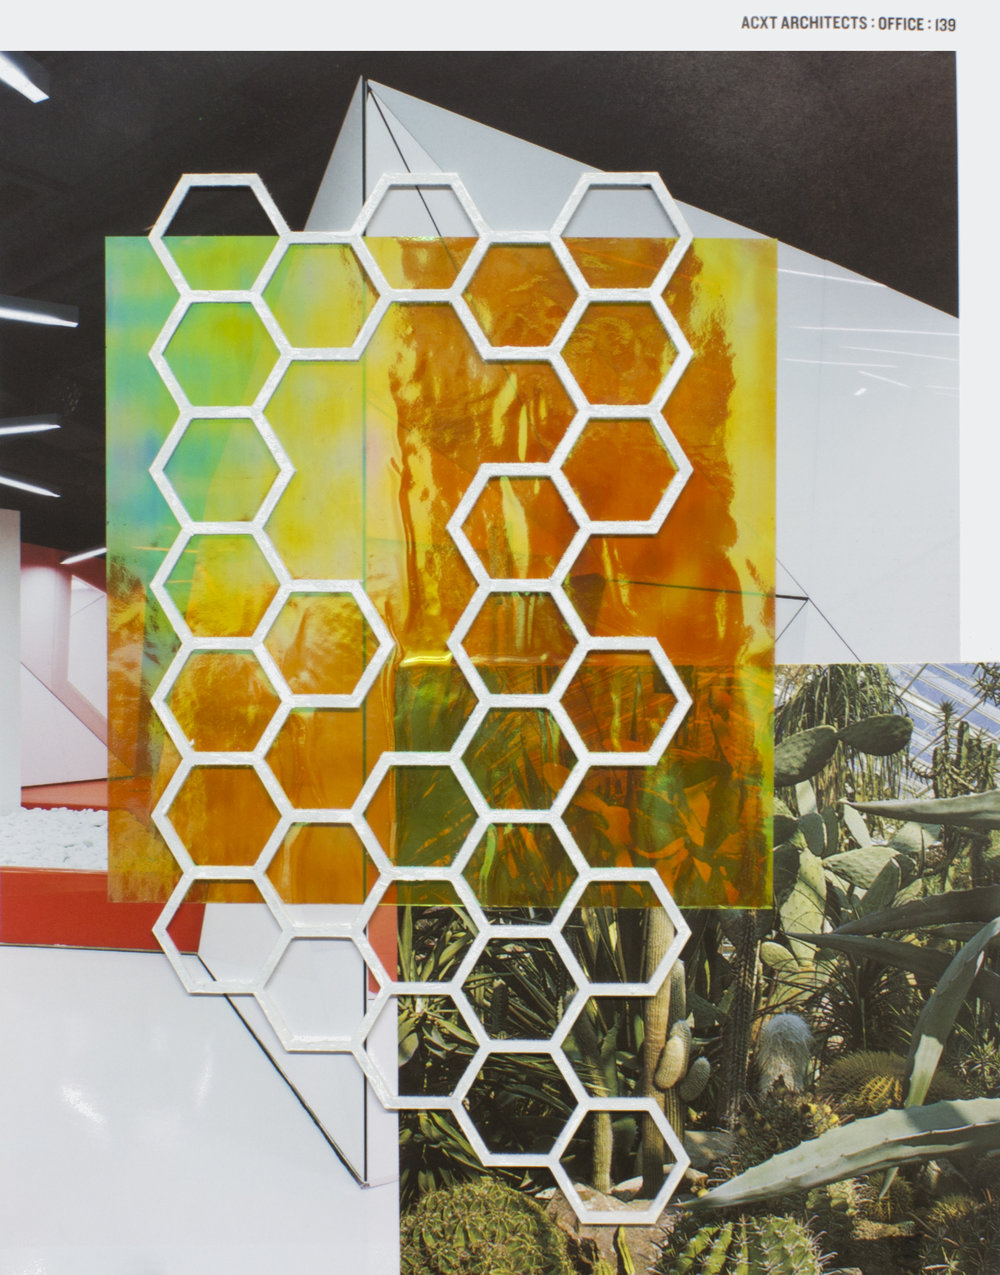 "Philippe Caron-Lefebvre,  Joug Mimétique , 2016, cardboard, found images, iridescent paper,15"" x 13"" (38 x 34 cm)."